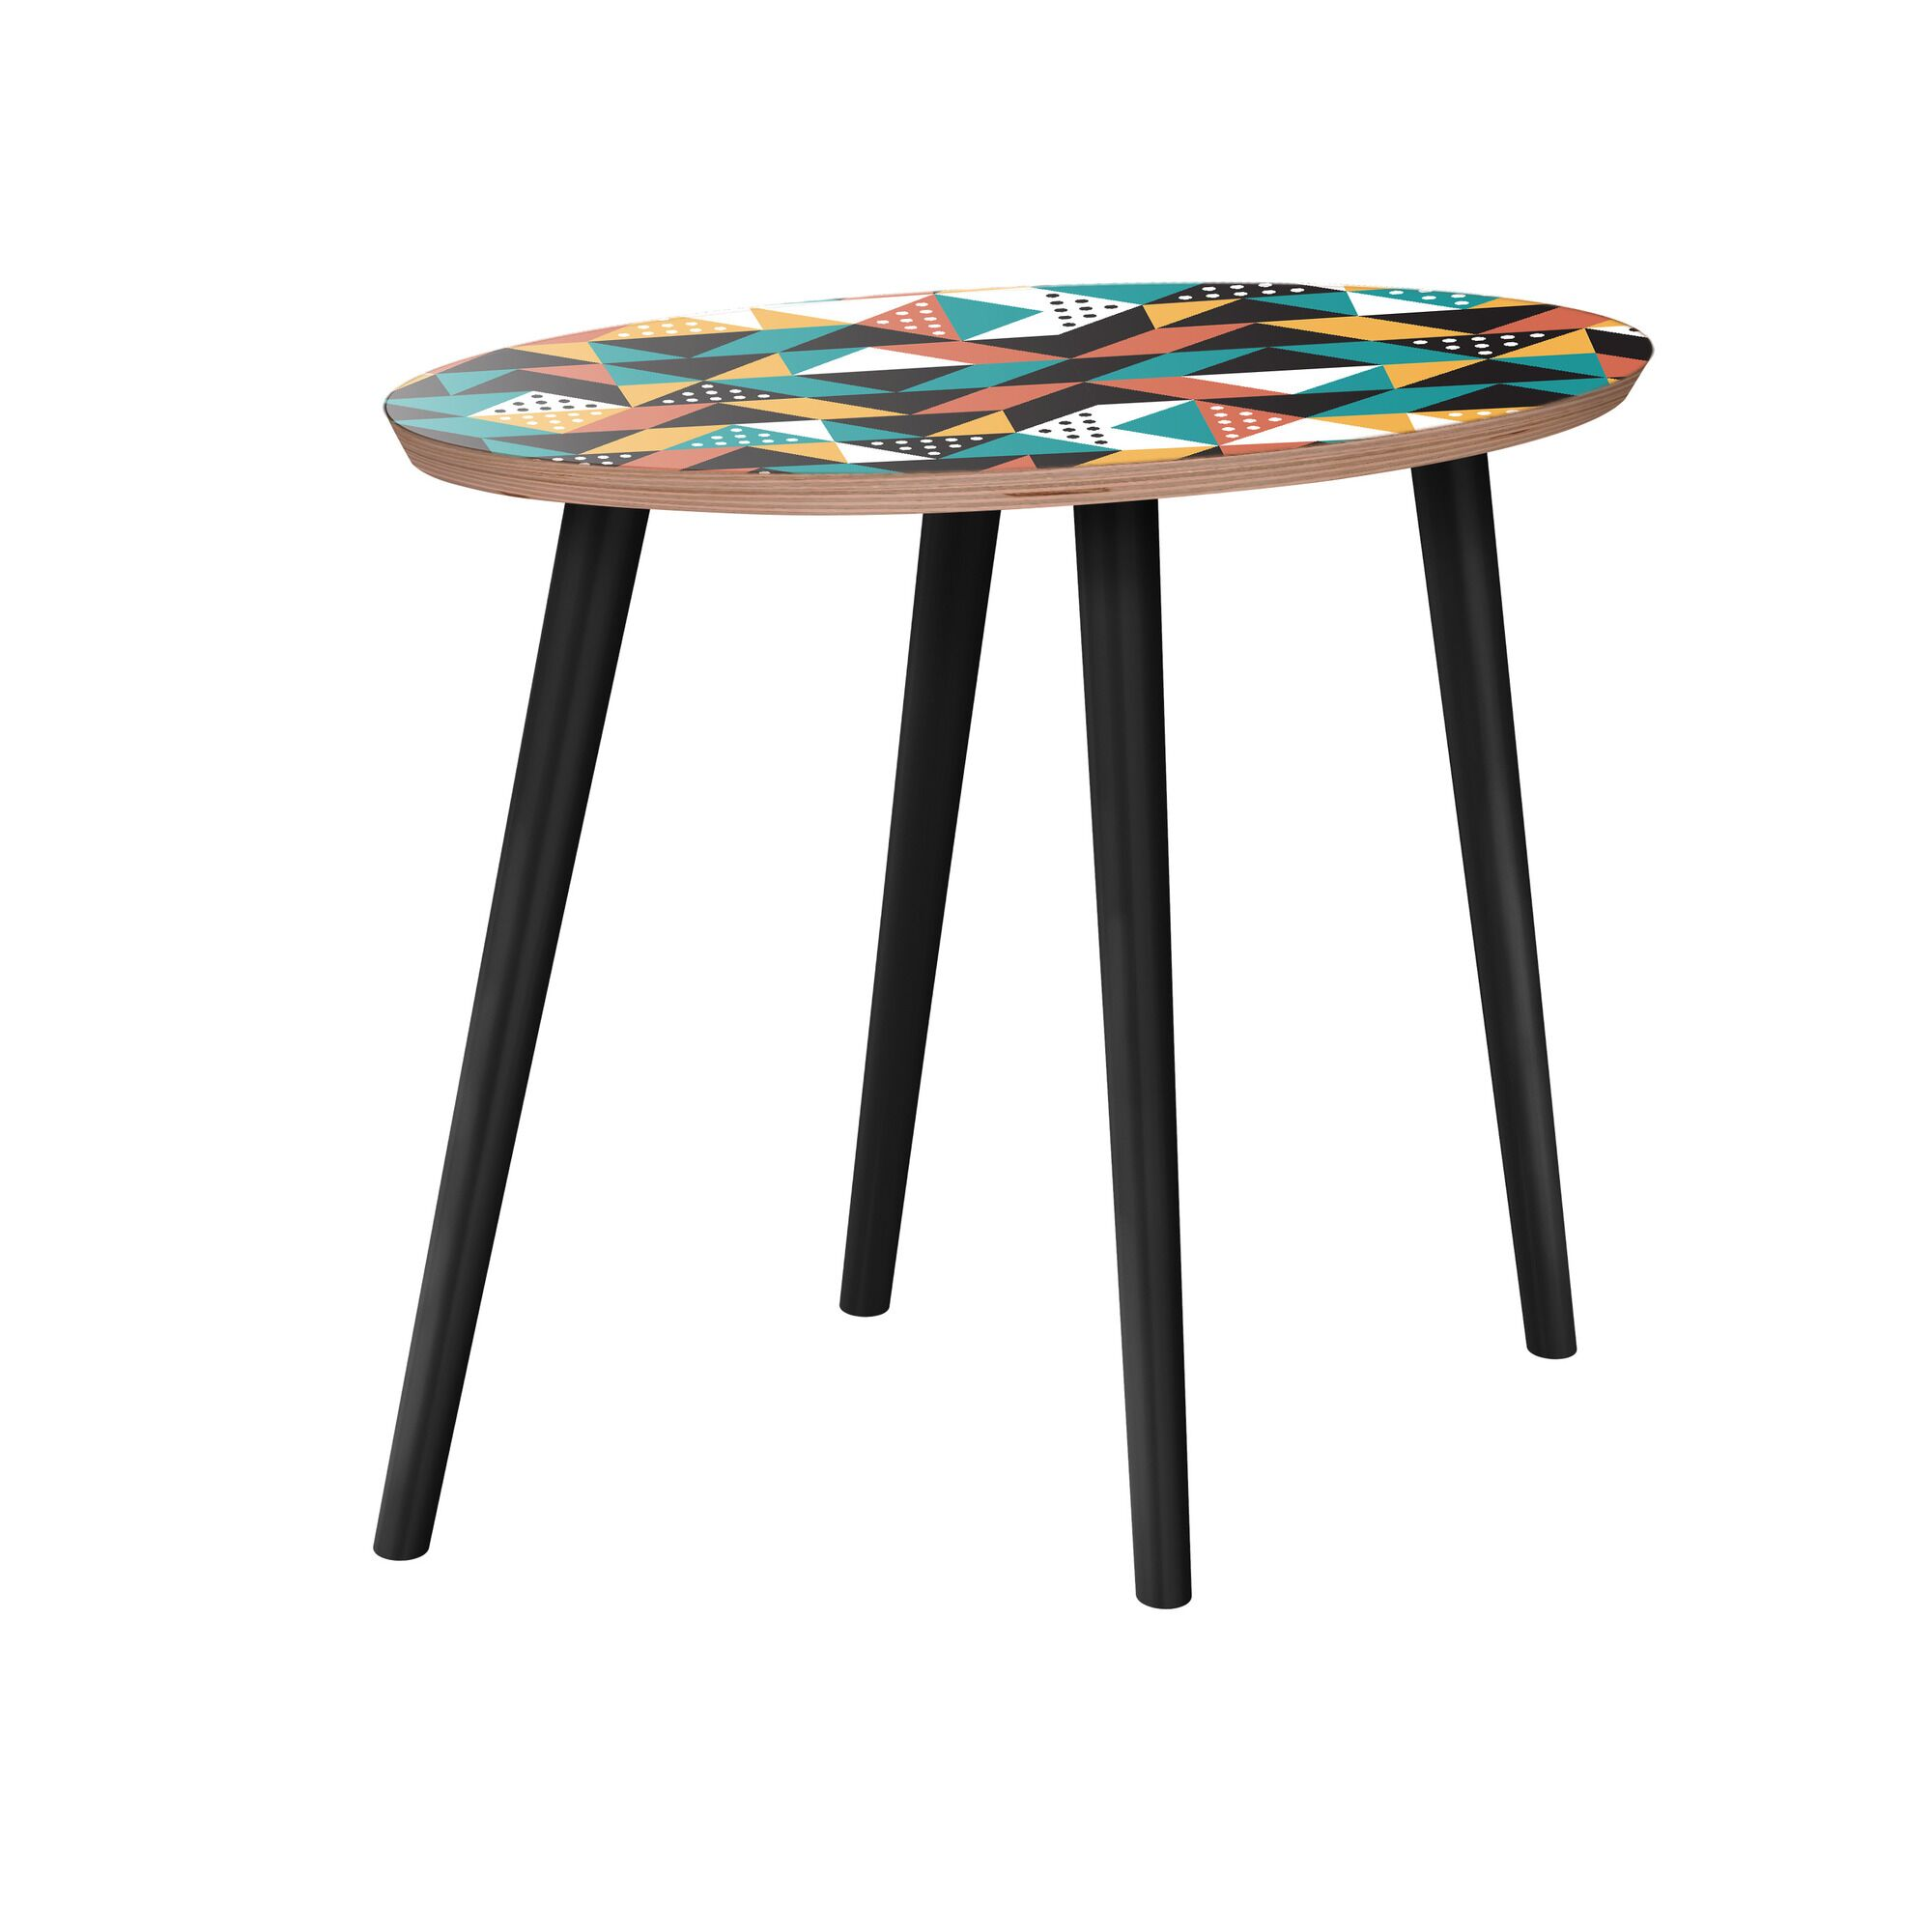 Arcelia End Table Table Base Color: Black, Table Top Color: Walnut